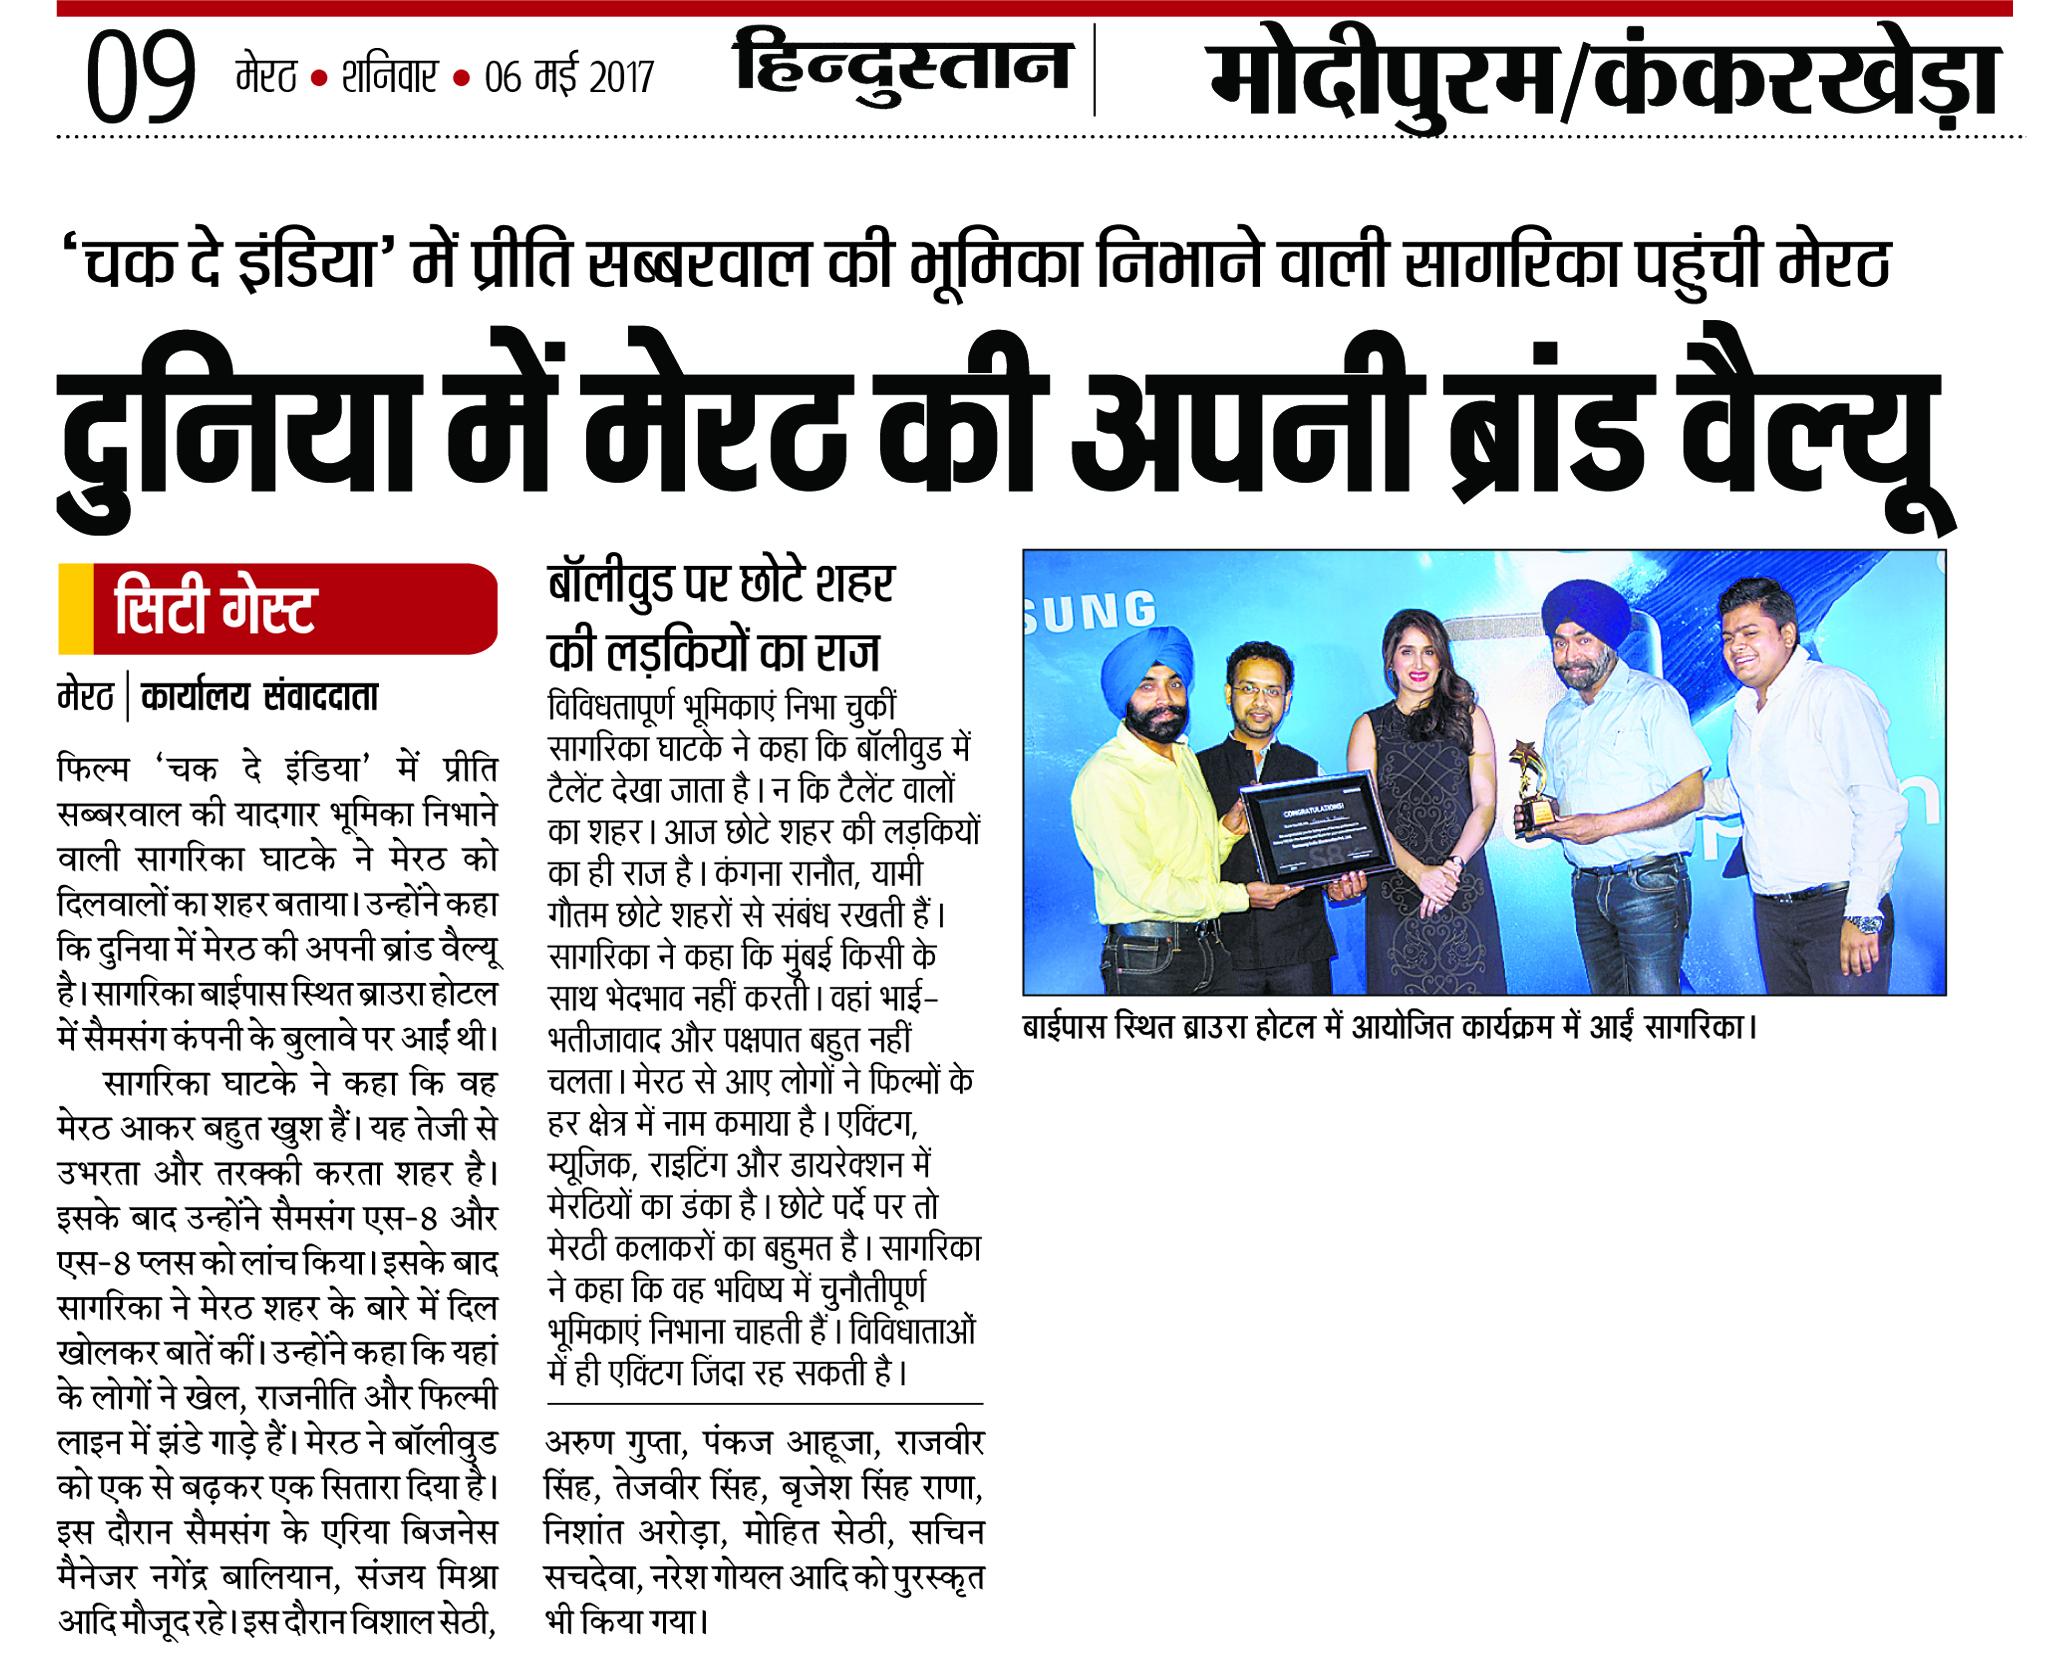 Bollywood Actress Sagarika Ghatge launches Samsung Galaxy S8 & S8